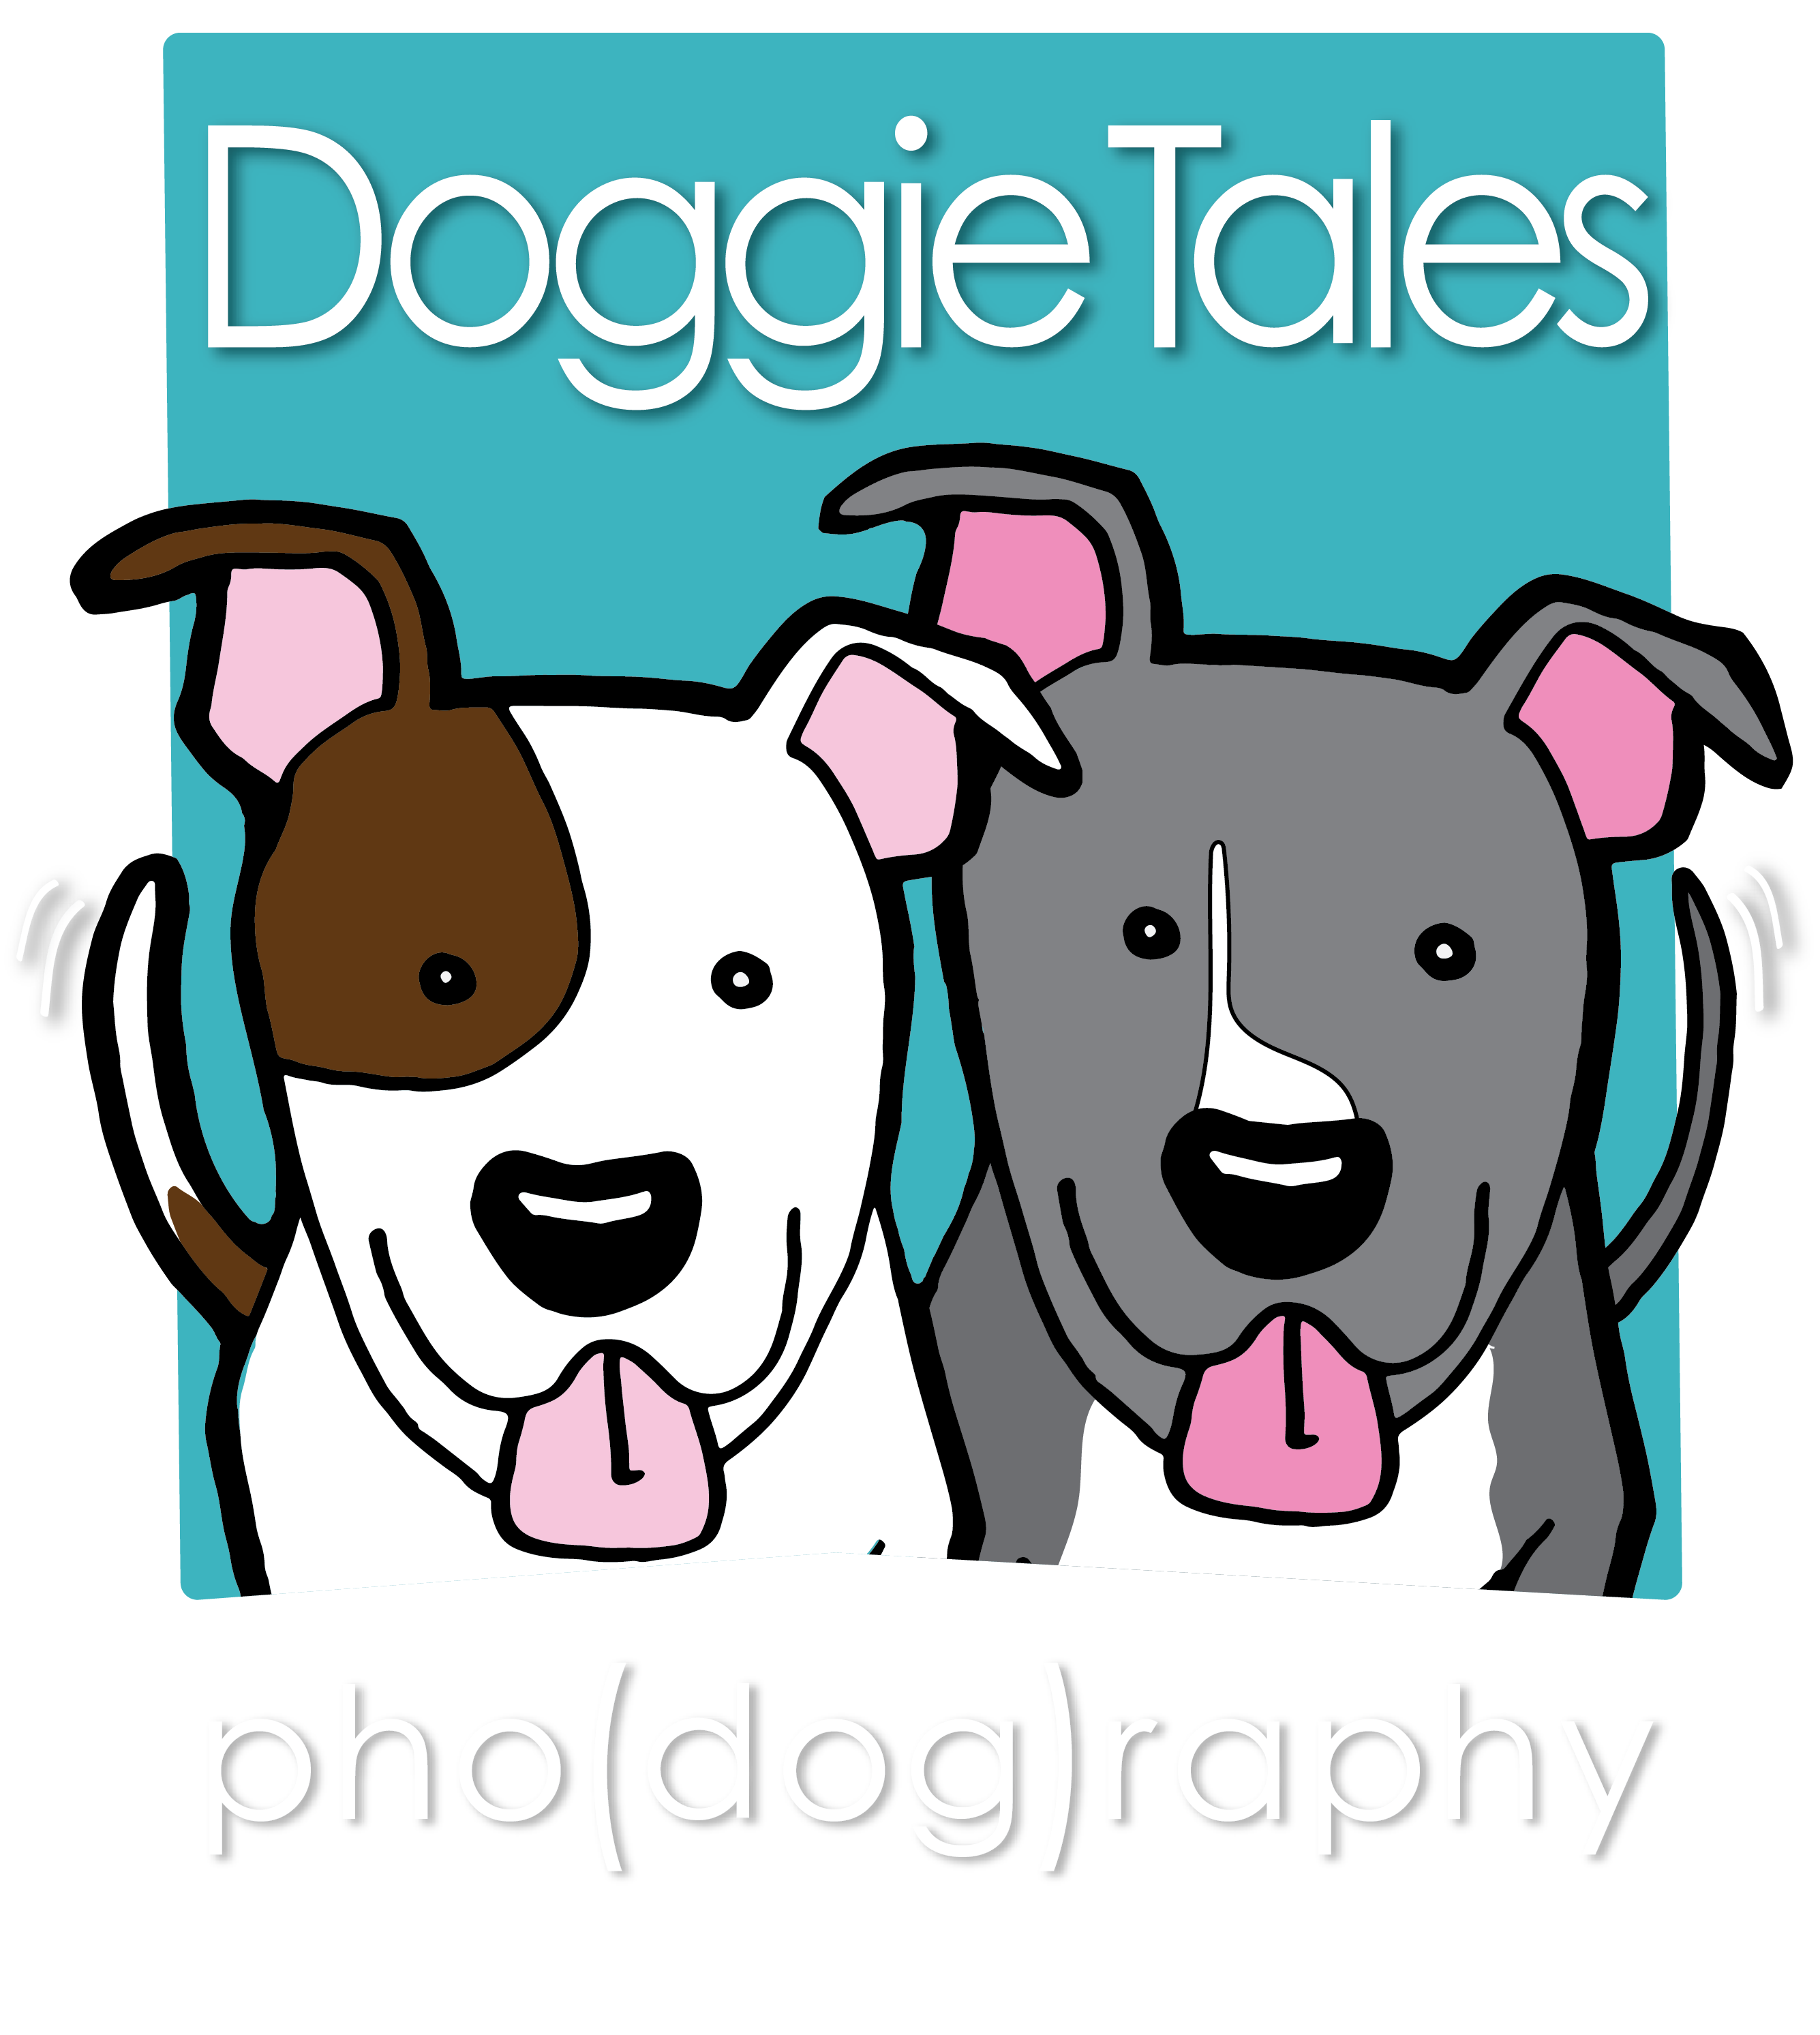 DoggieTales Phodography